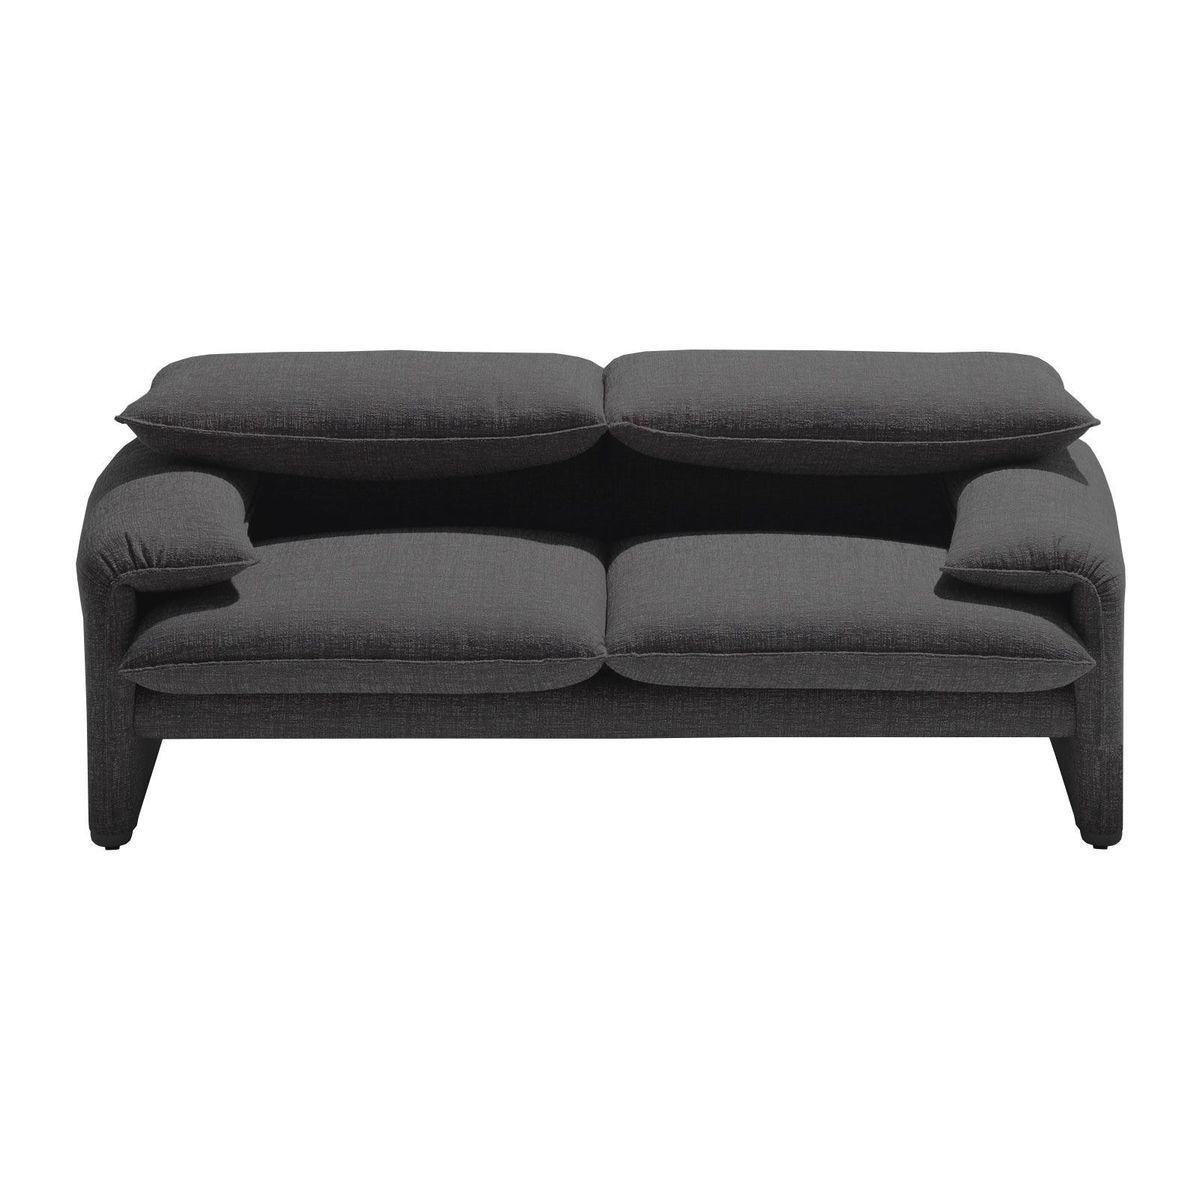 maralunga 40 2 sitzer sofa 190x86cm cassina. Black Bedroom Furniture Sets. Home Design Ideas